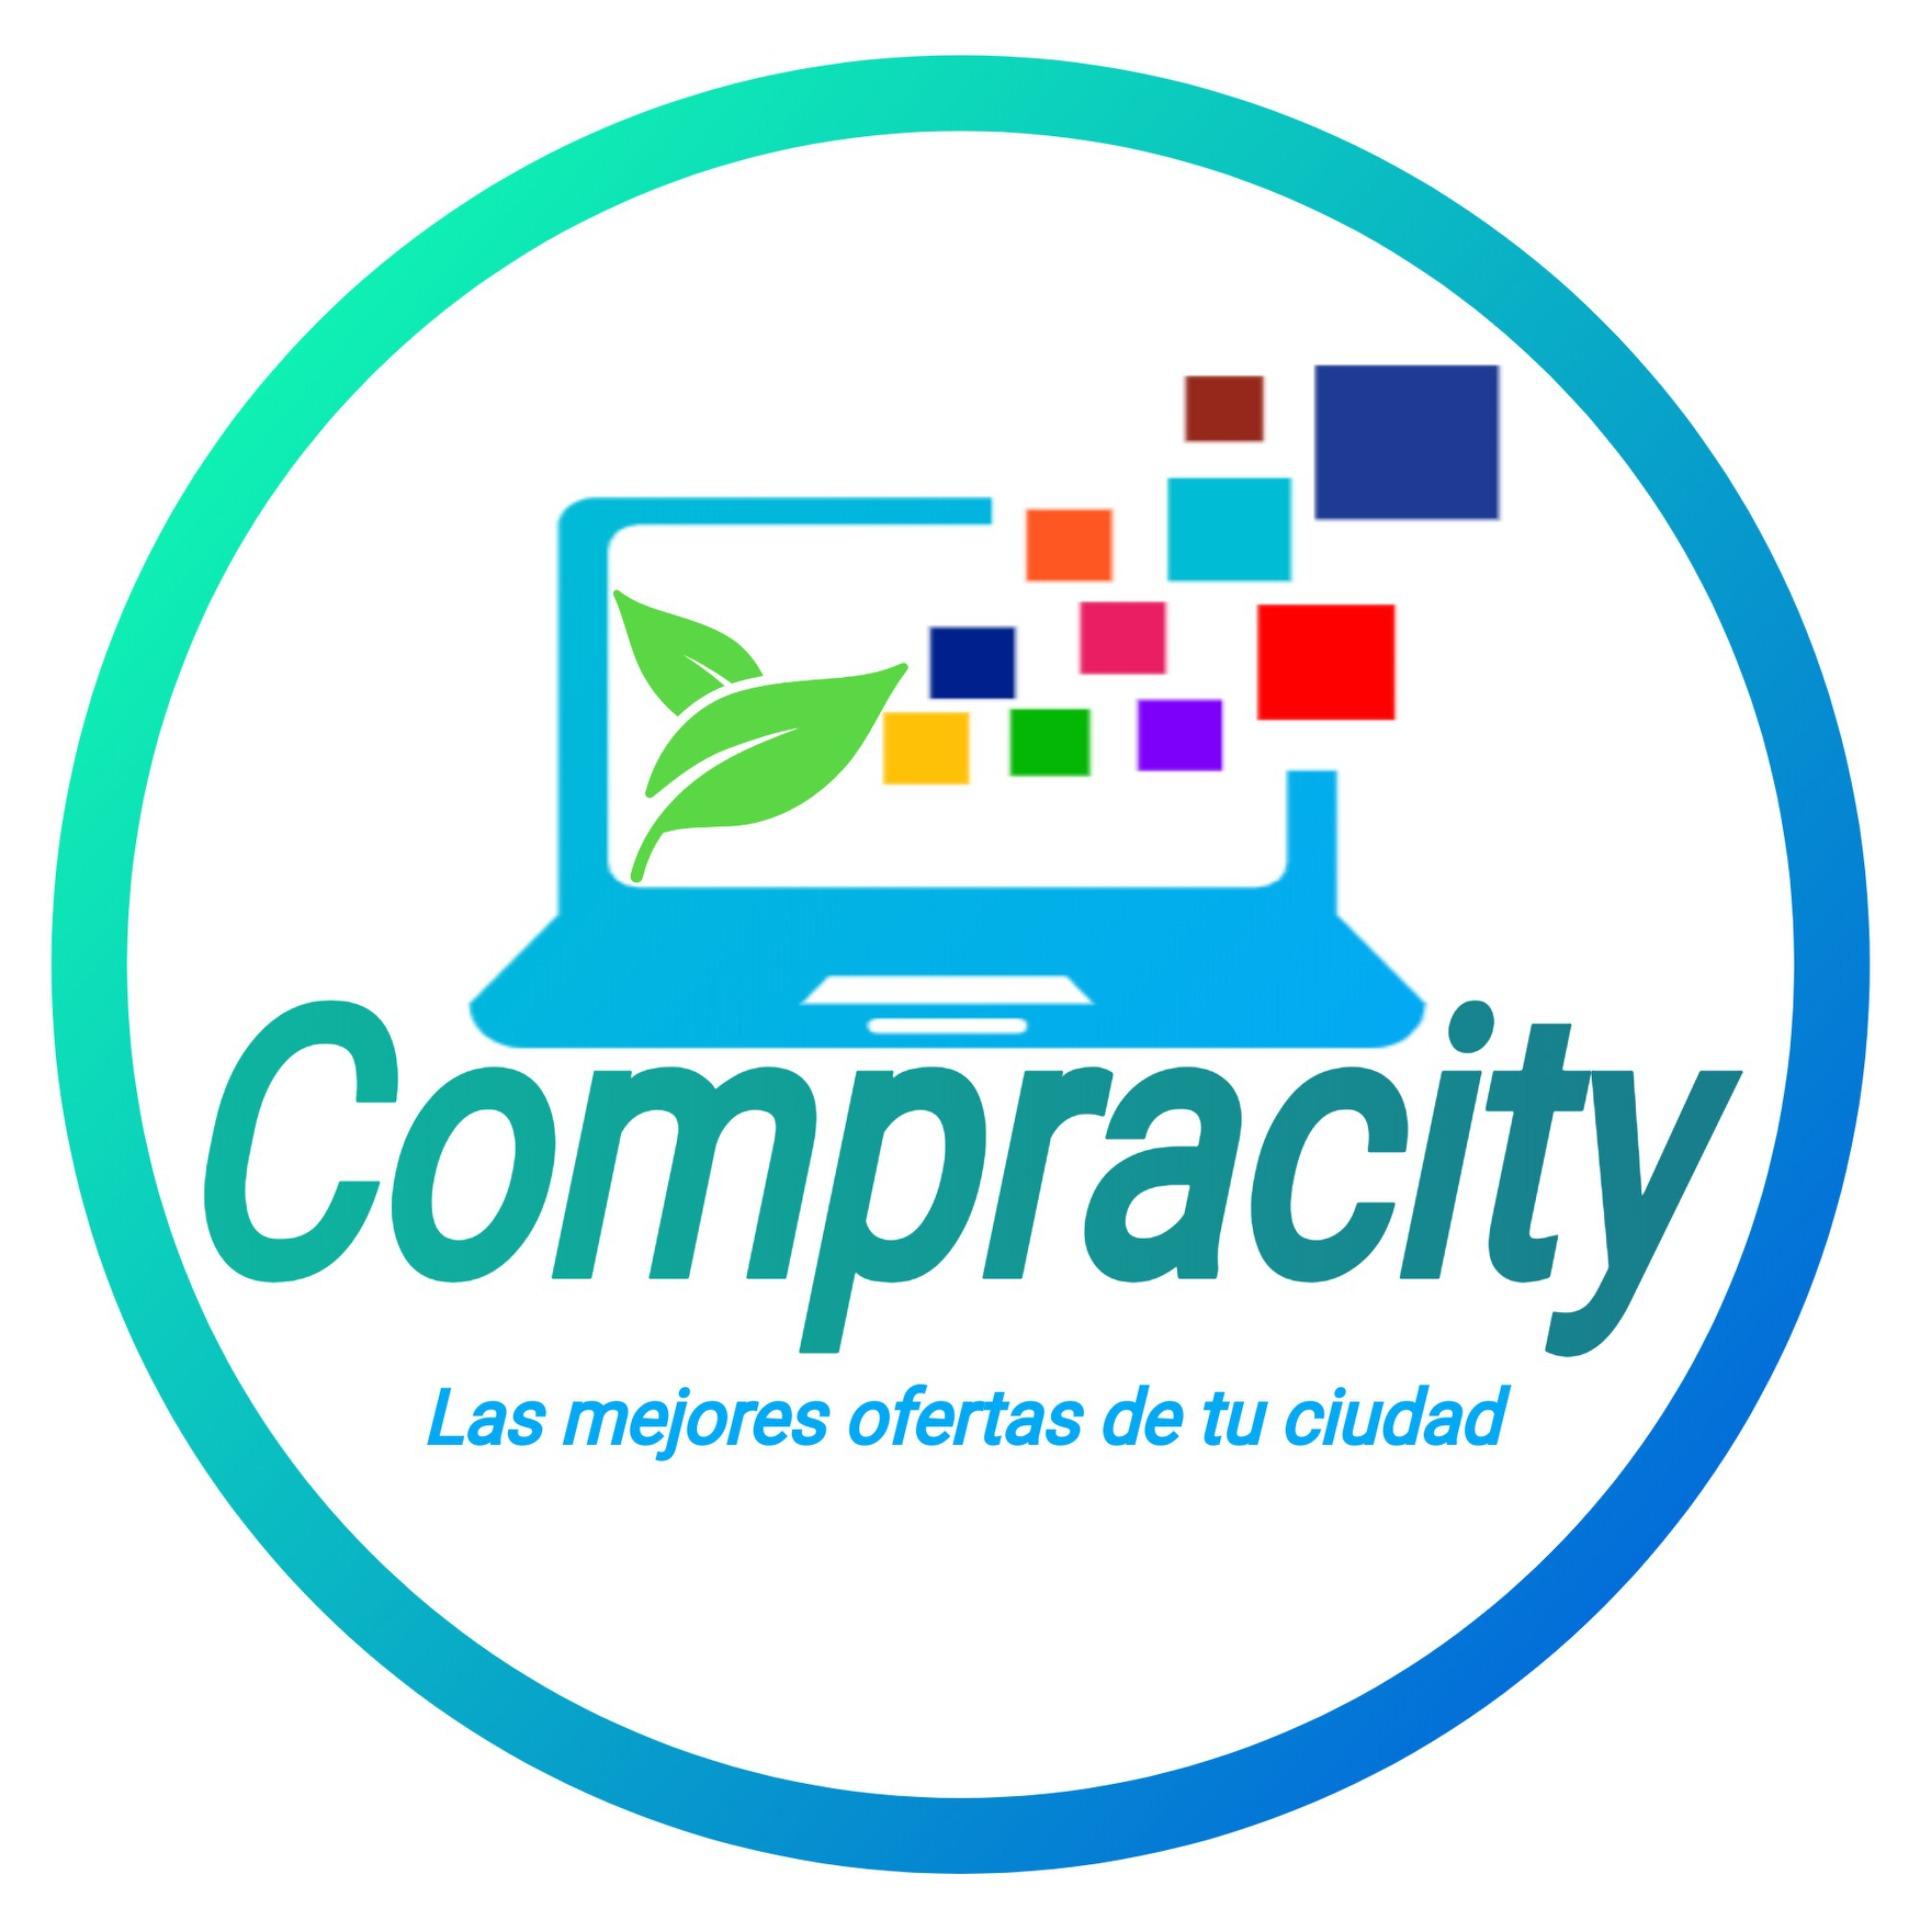 COMPRACITY